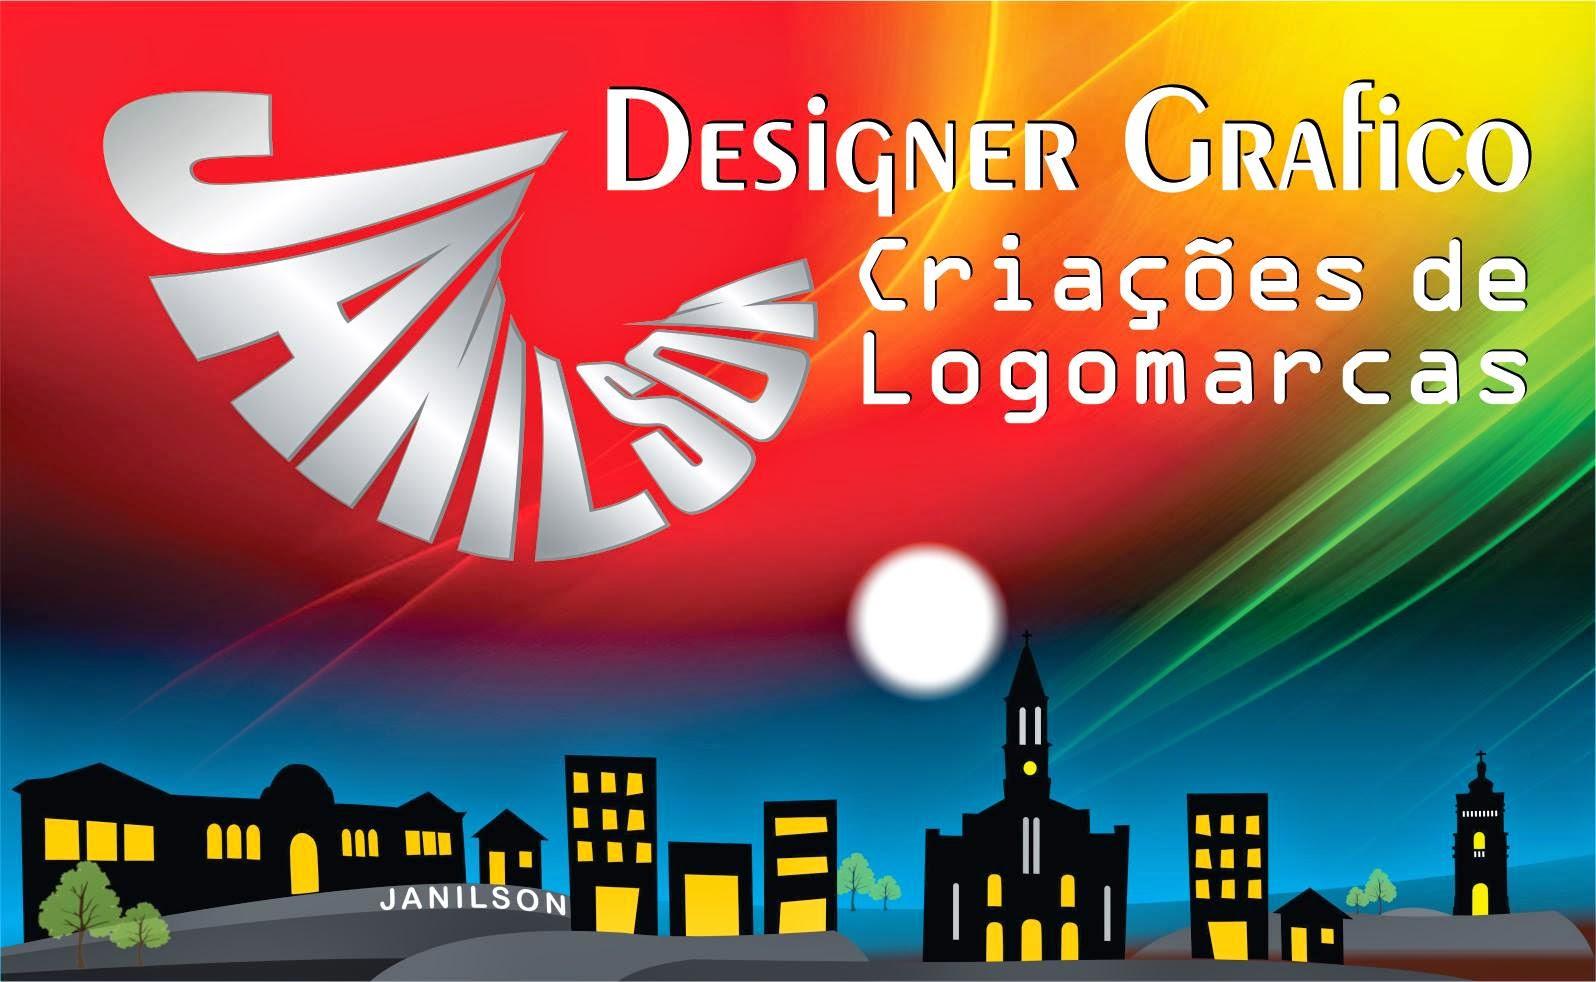 Janilson Designer Grafico